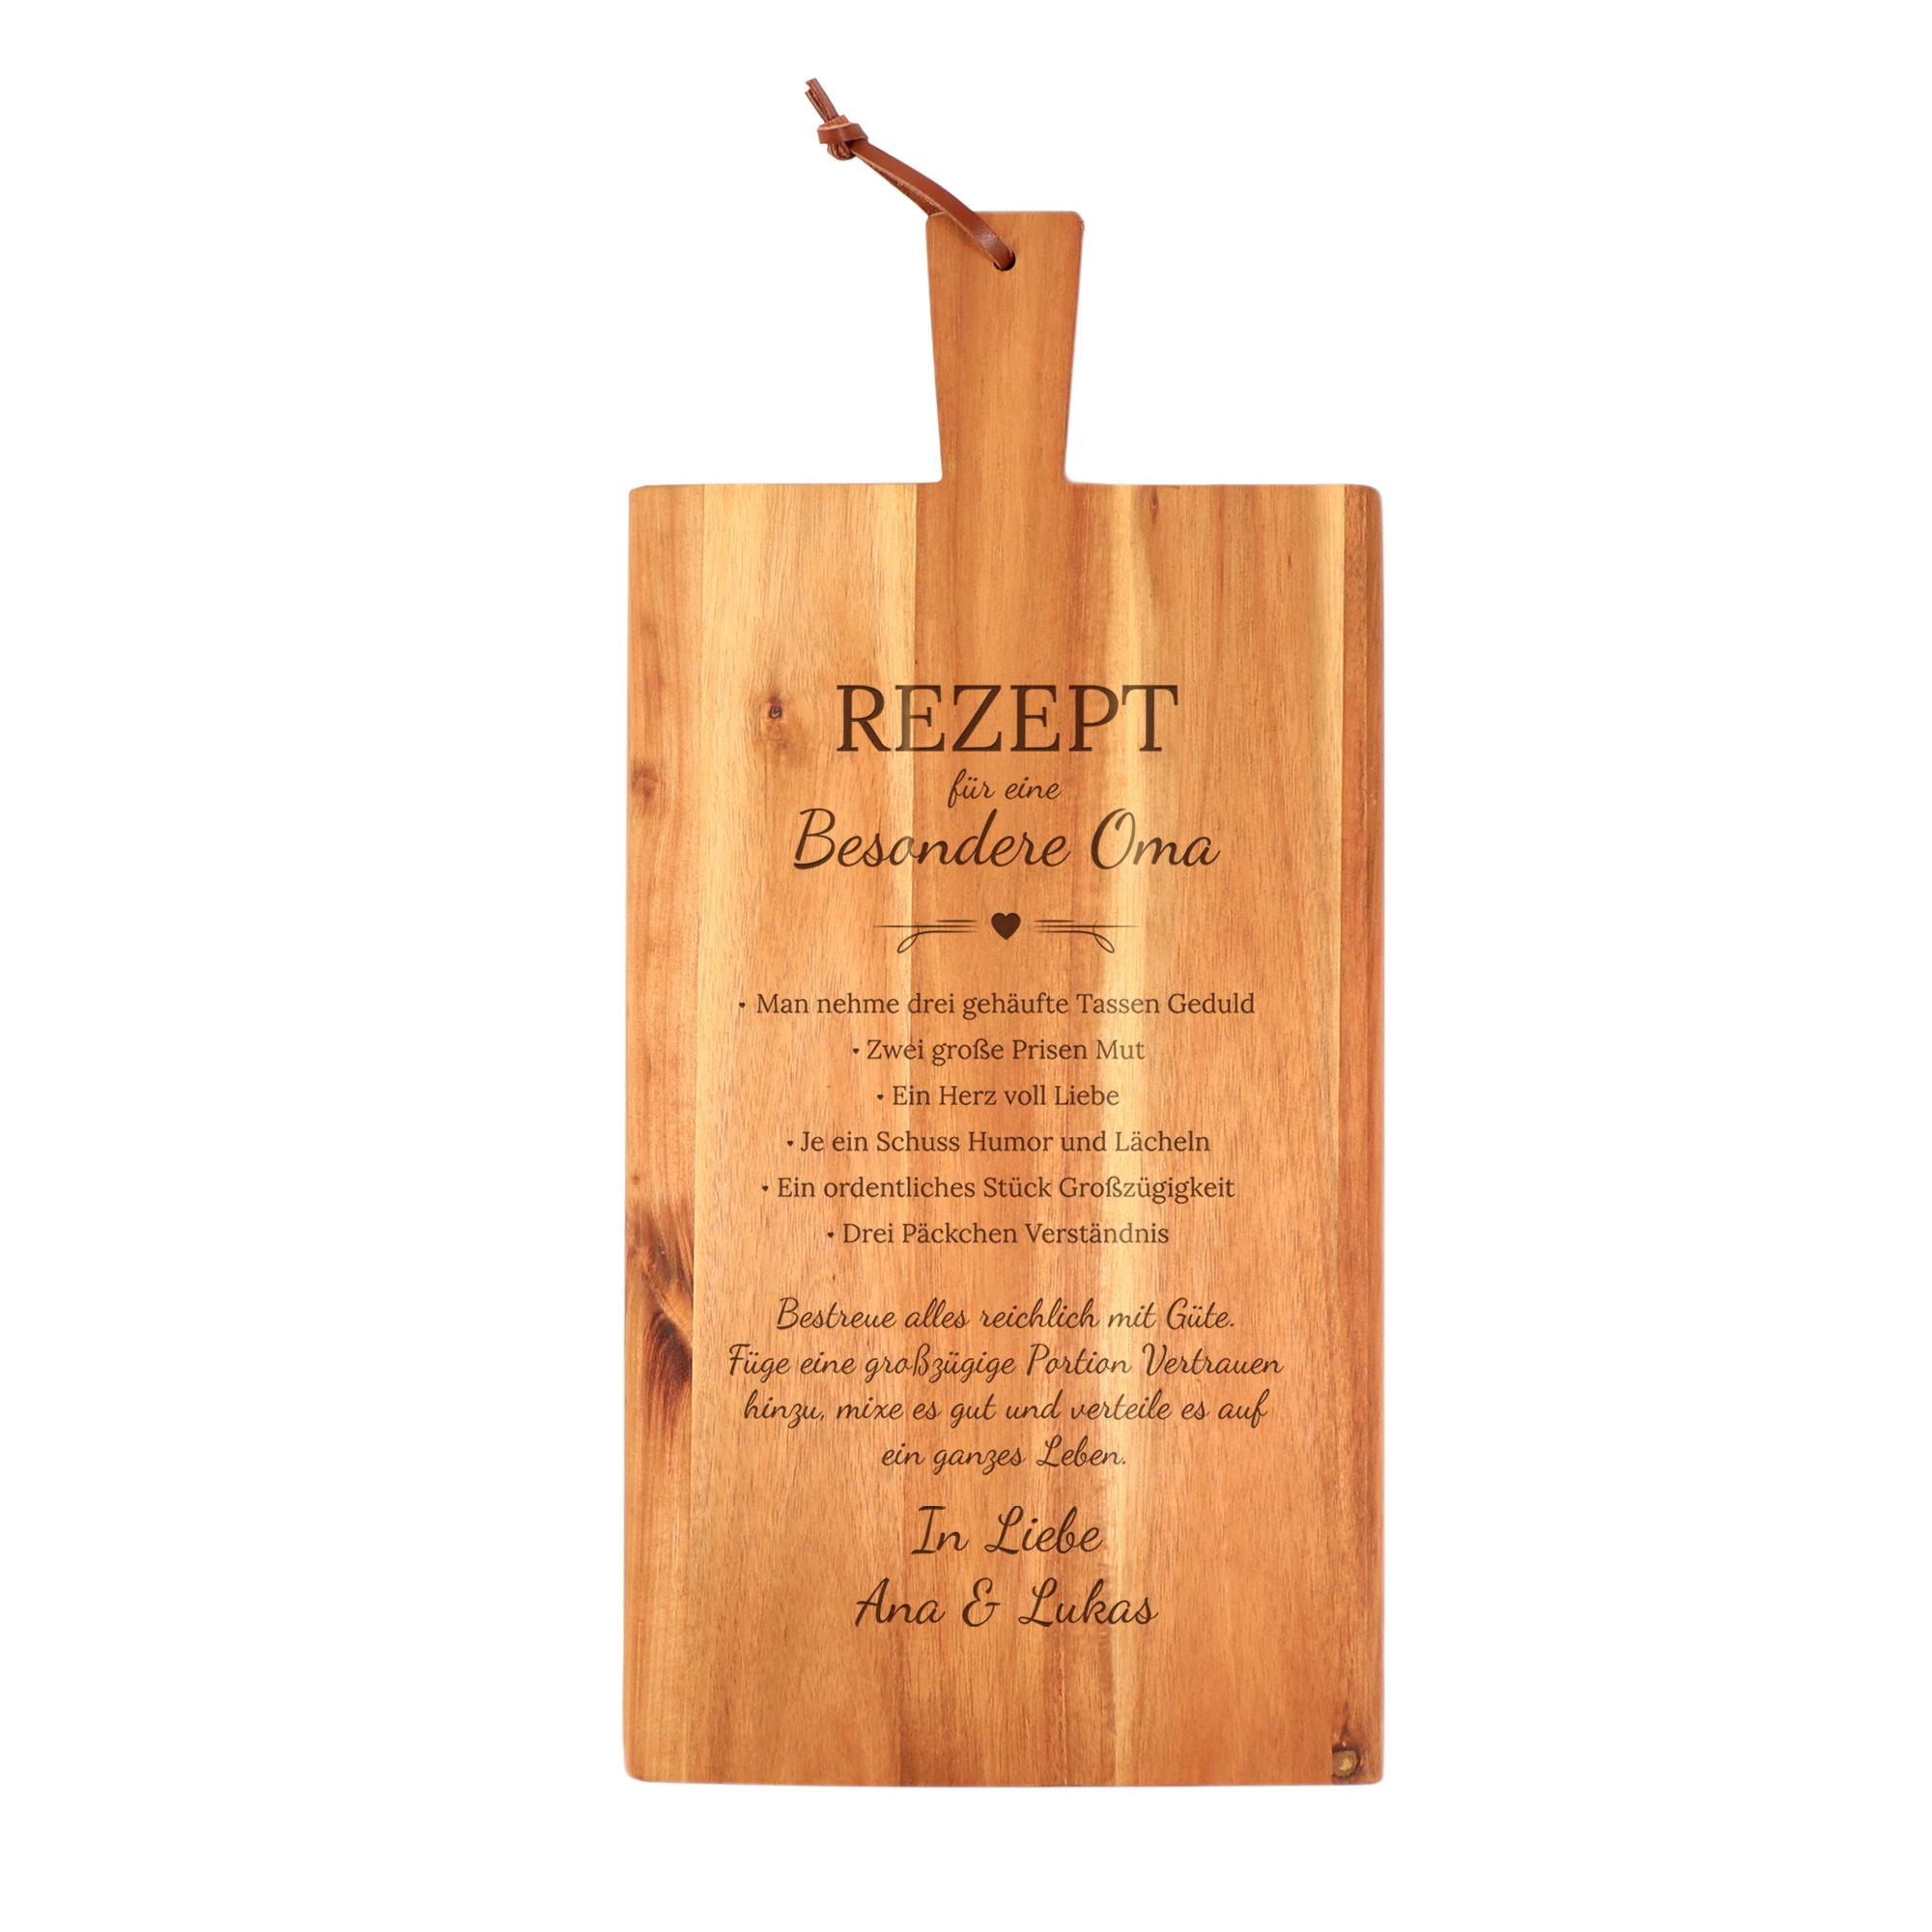 Schneidebrett mit Griff - Rezept Oma Namen - Personalisiert